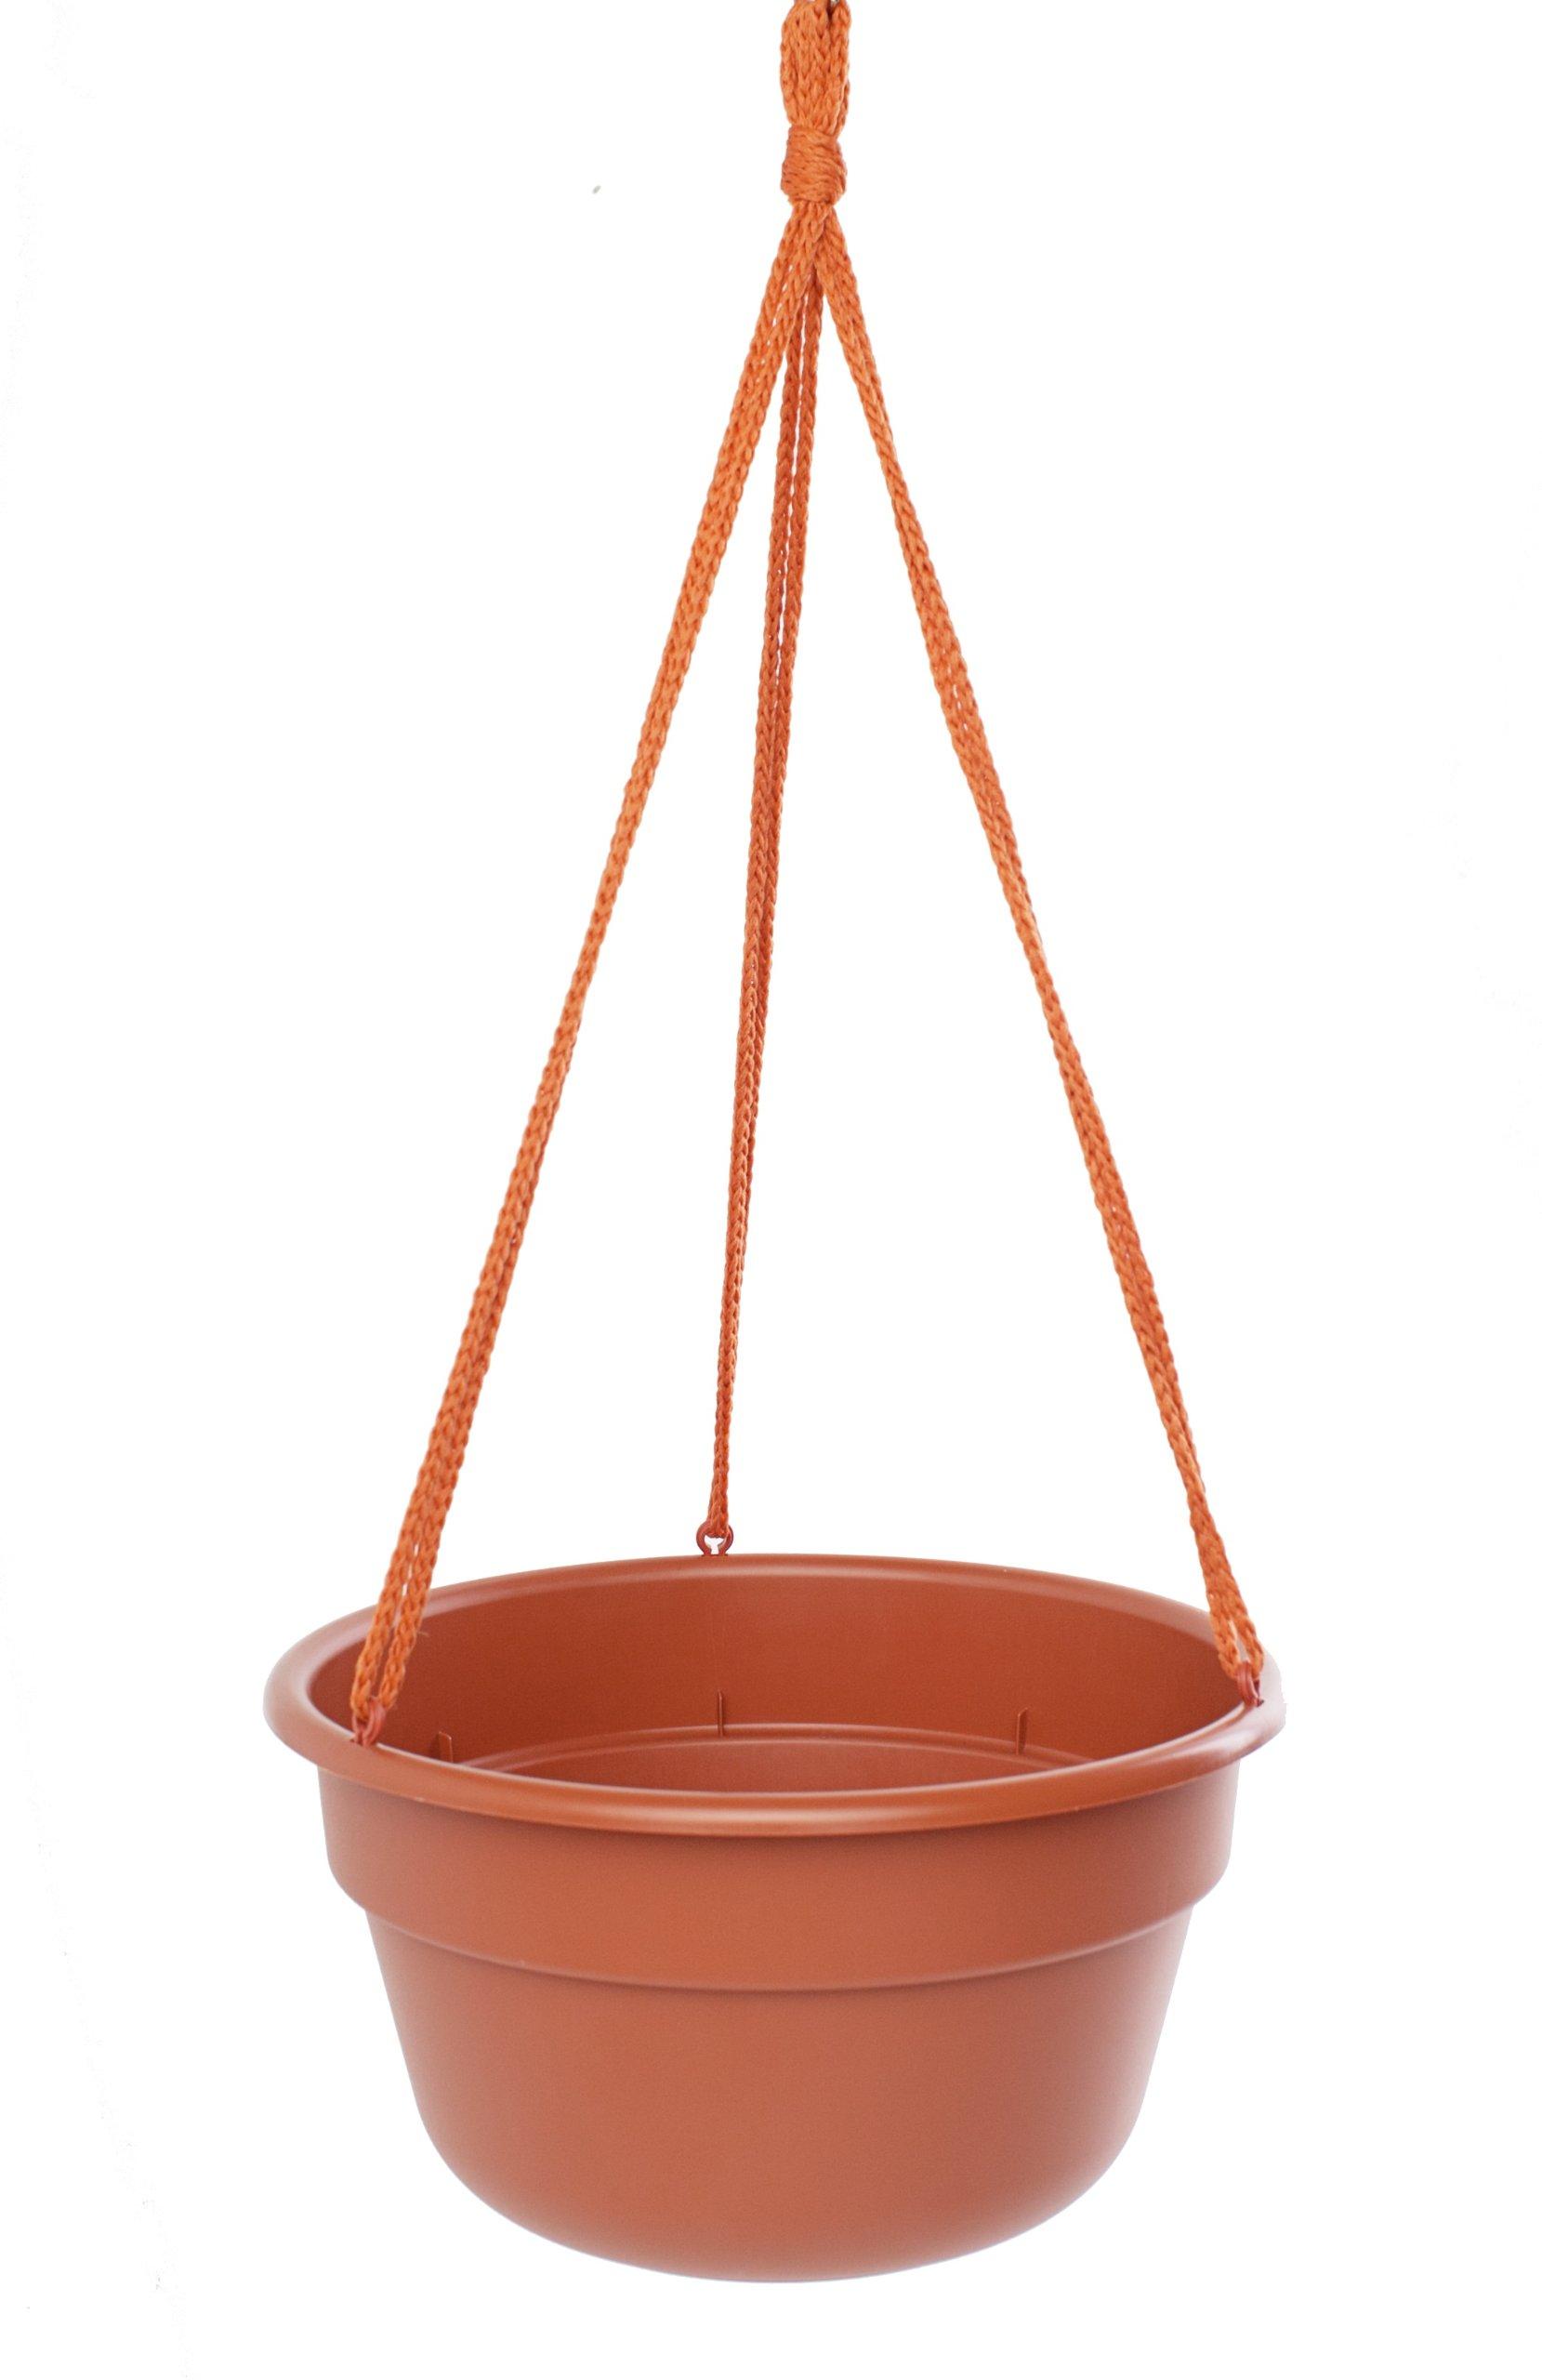 Bloem DCHB1246-12 12-Pack Dura Cotta Hanging Basket/Planter, 12-Inch, Terra Cotta